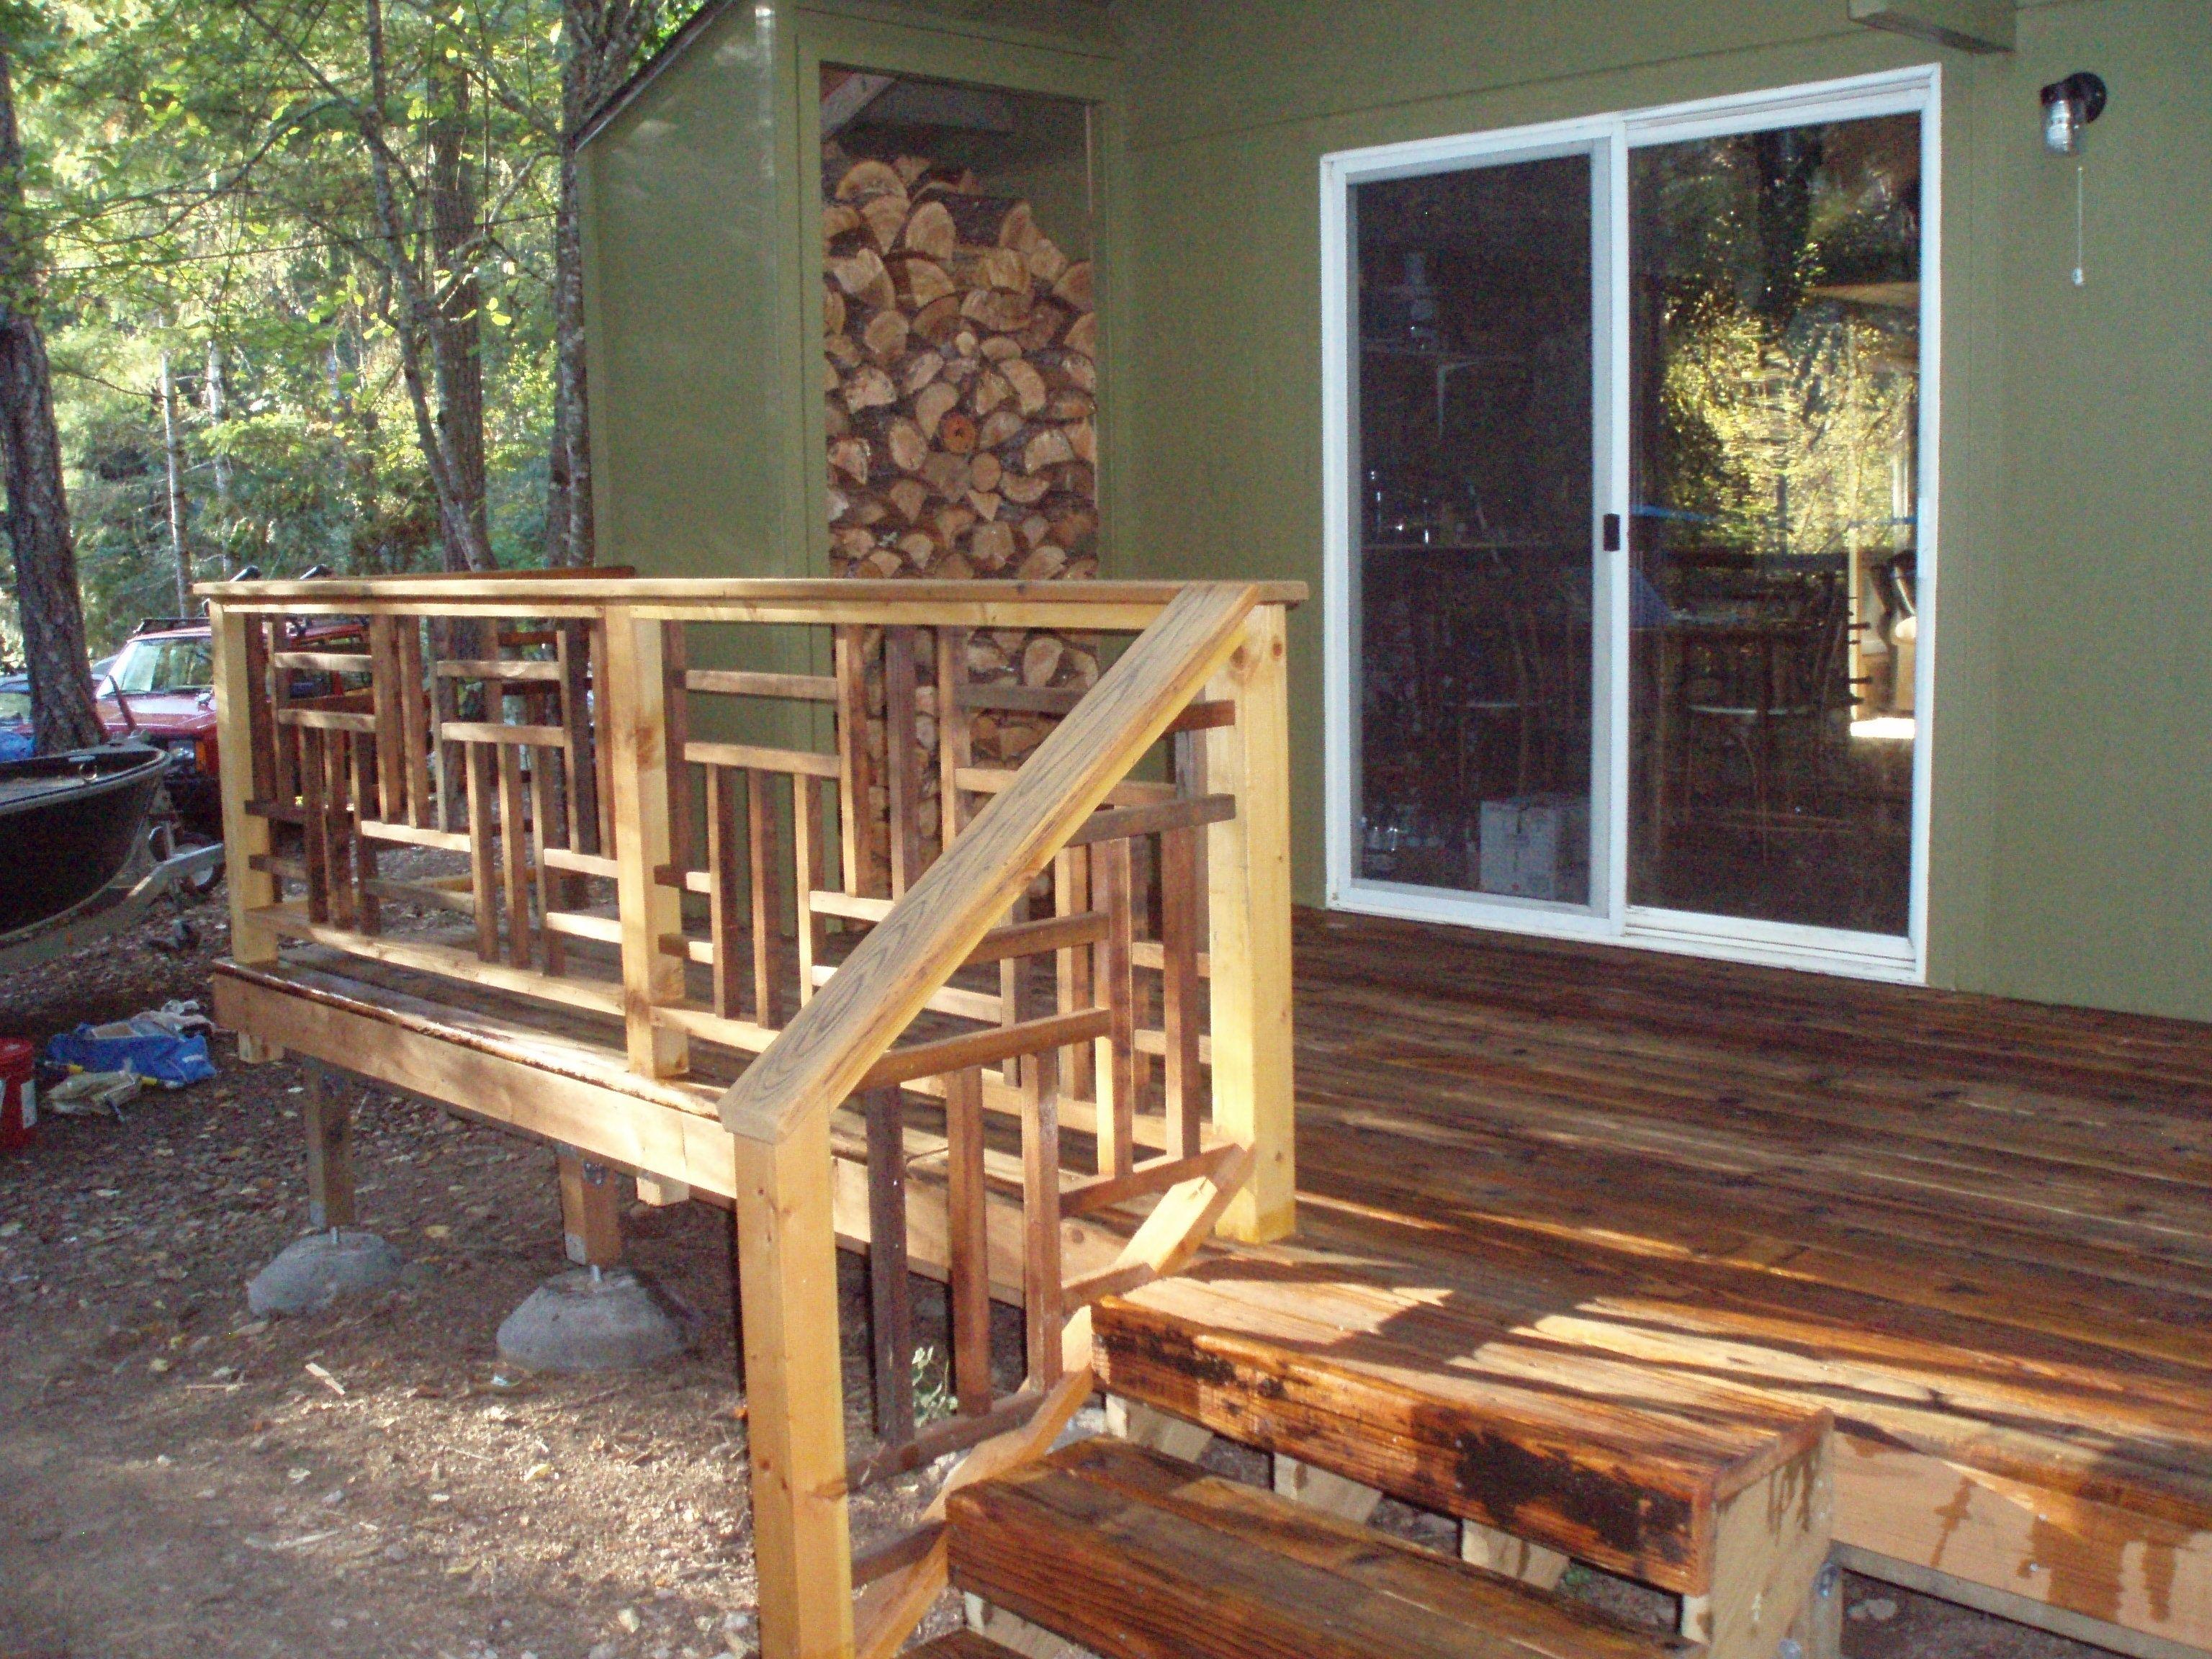 Rail Designs Porch Railing Diy Bench Outdoor Wood Railing